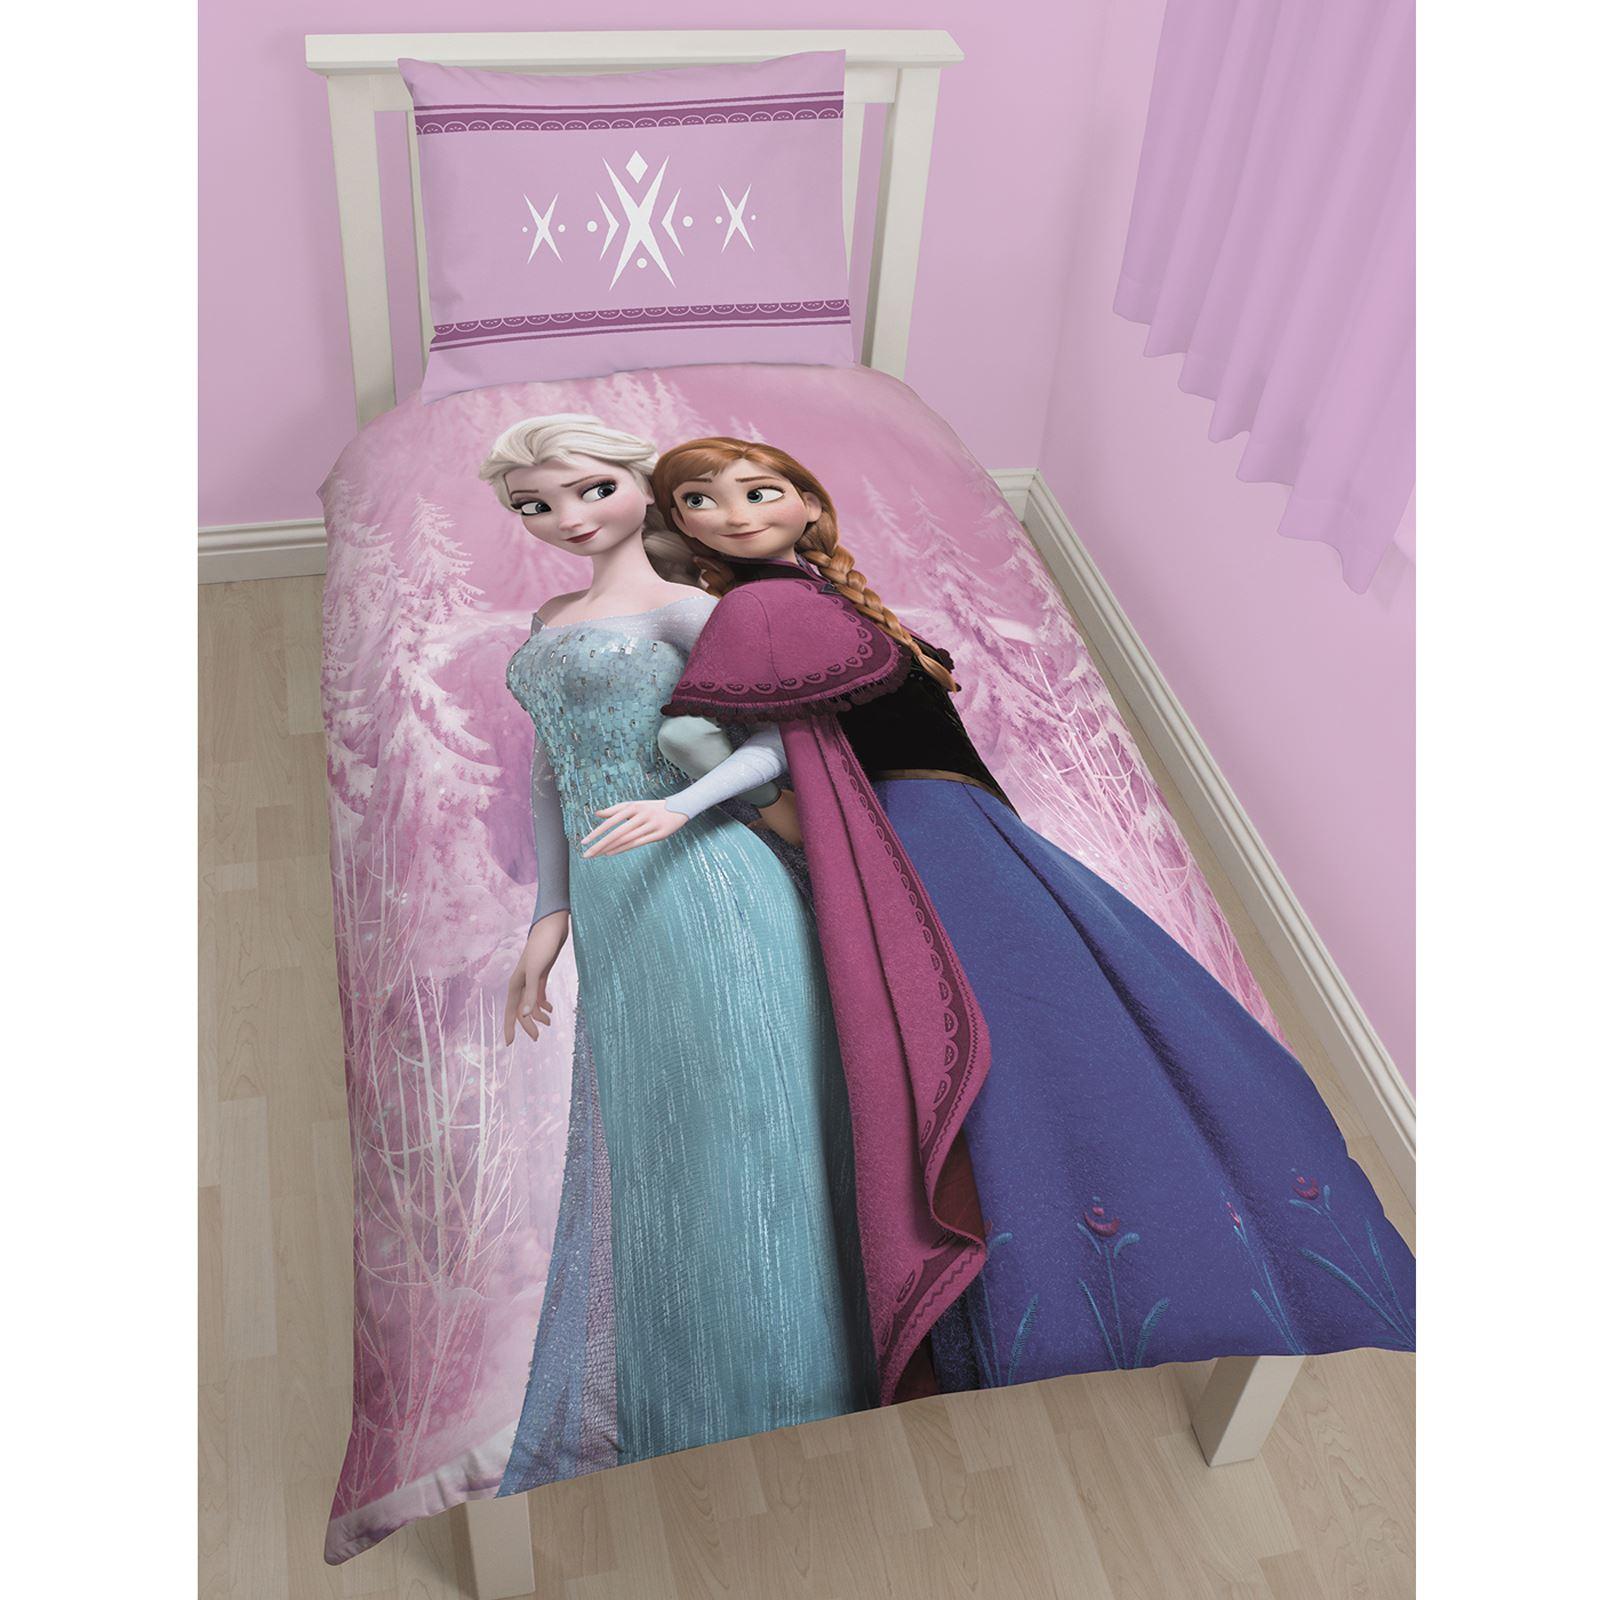 DISNEY FROZEN DUVET QUILT COVERS BEDDING JUNIOR SINGLE DOUBLE ANNA ... : frozen quilt cover - Adamdwight.com